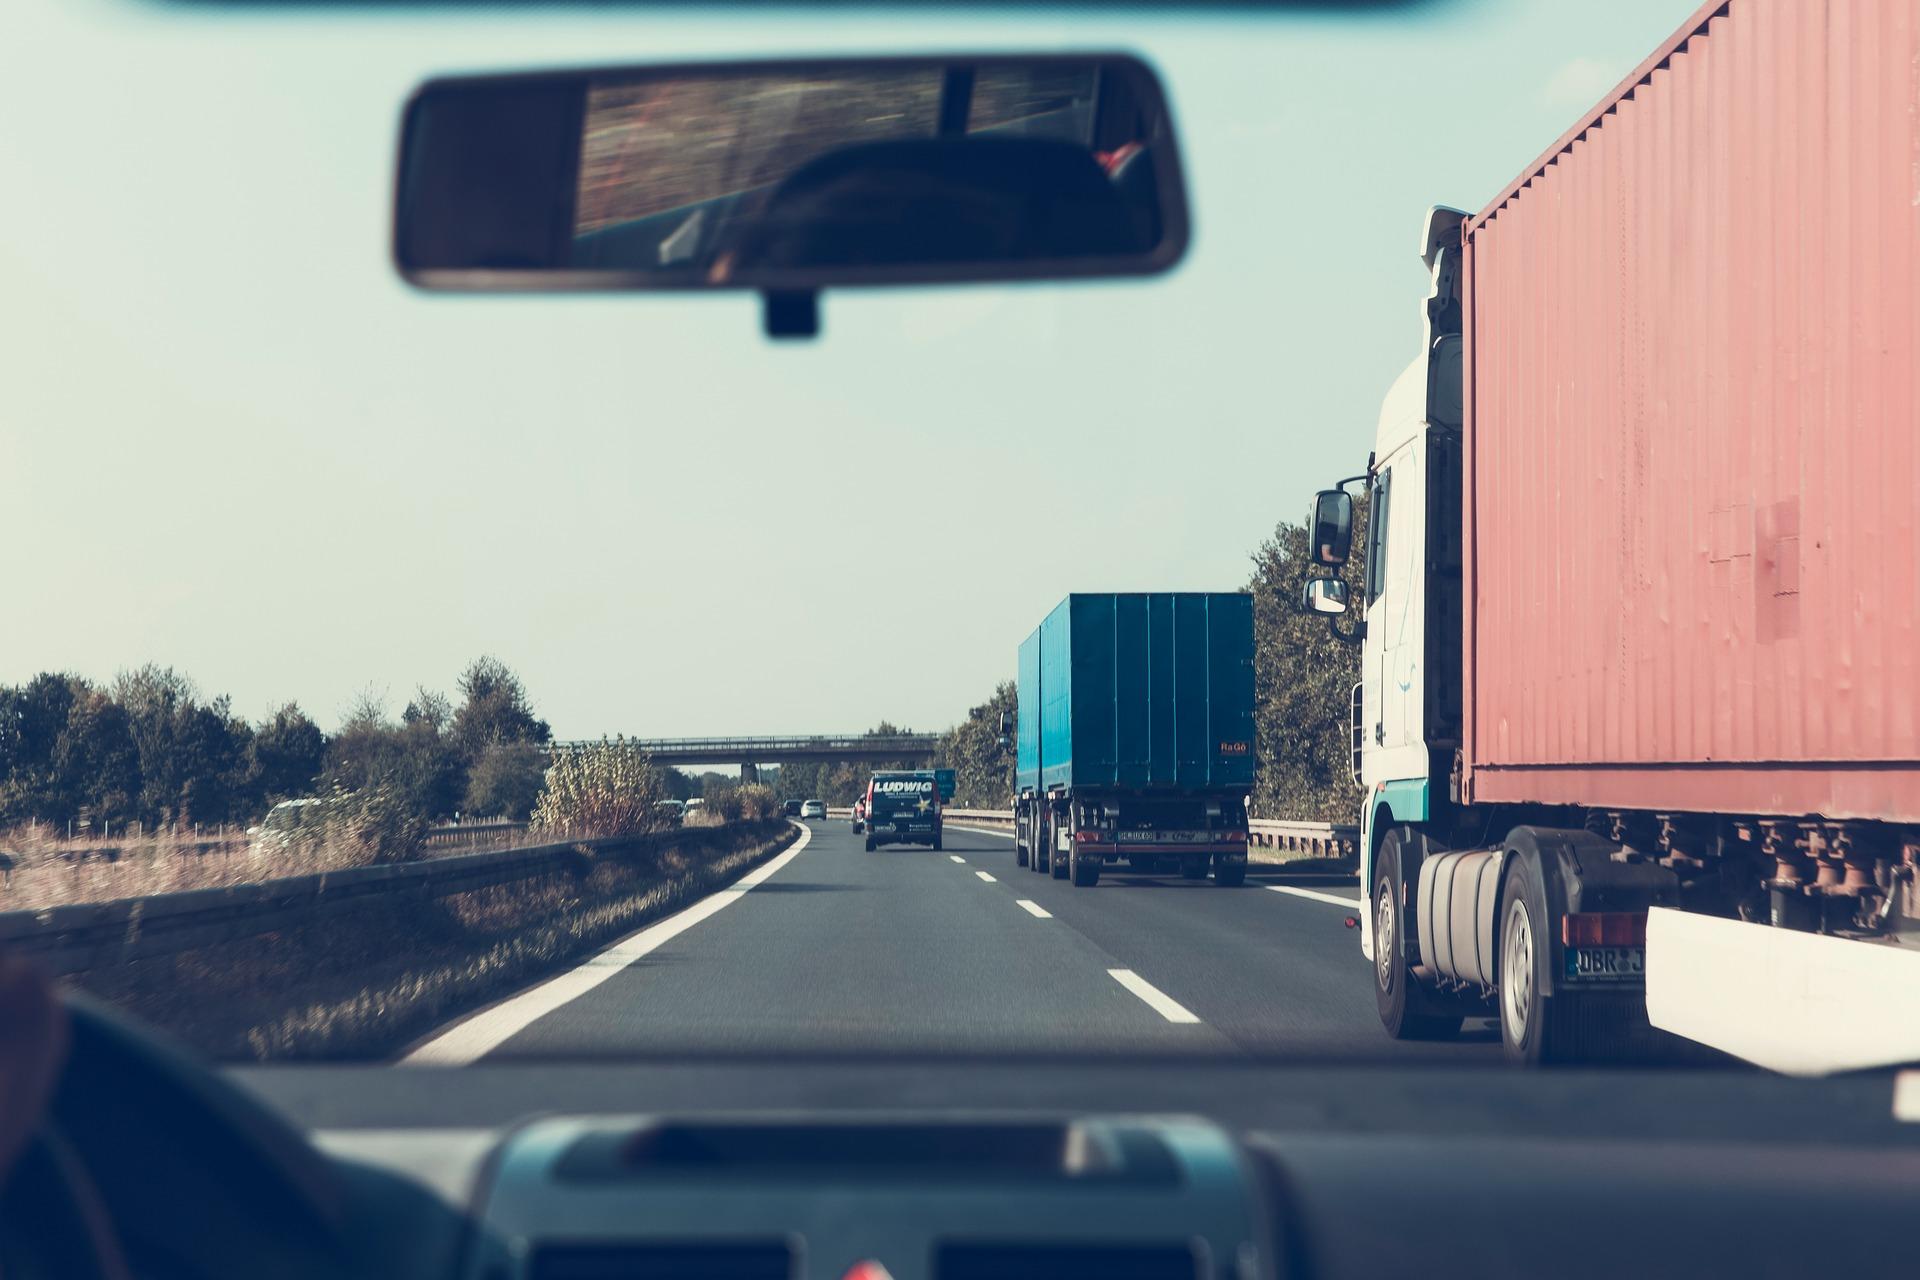 highway-2606937_1920.jpg